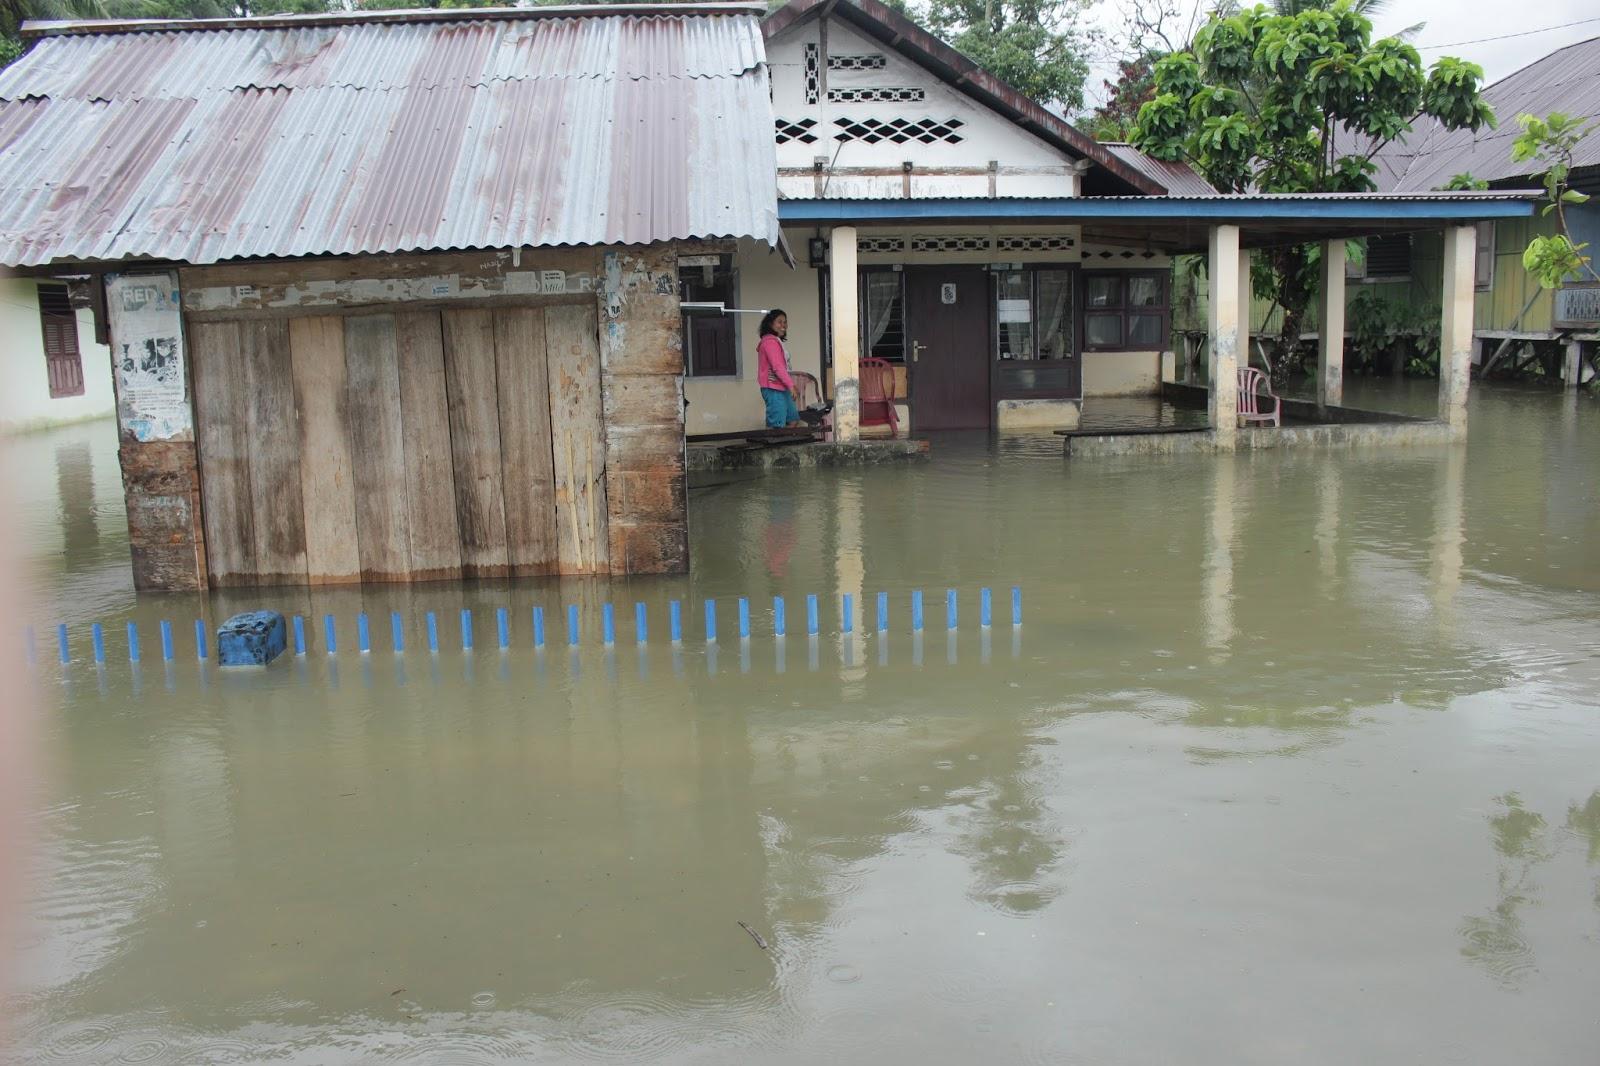 Sebuah rumah yang terkena bencana banjir di Desa Bolangat Kecamatan Sangtombolang. (Foto :DTN)